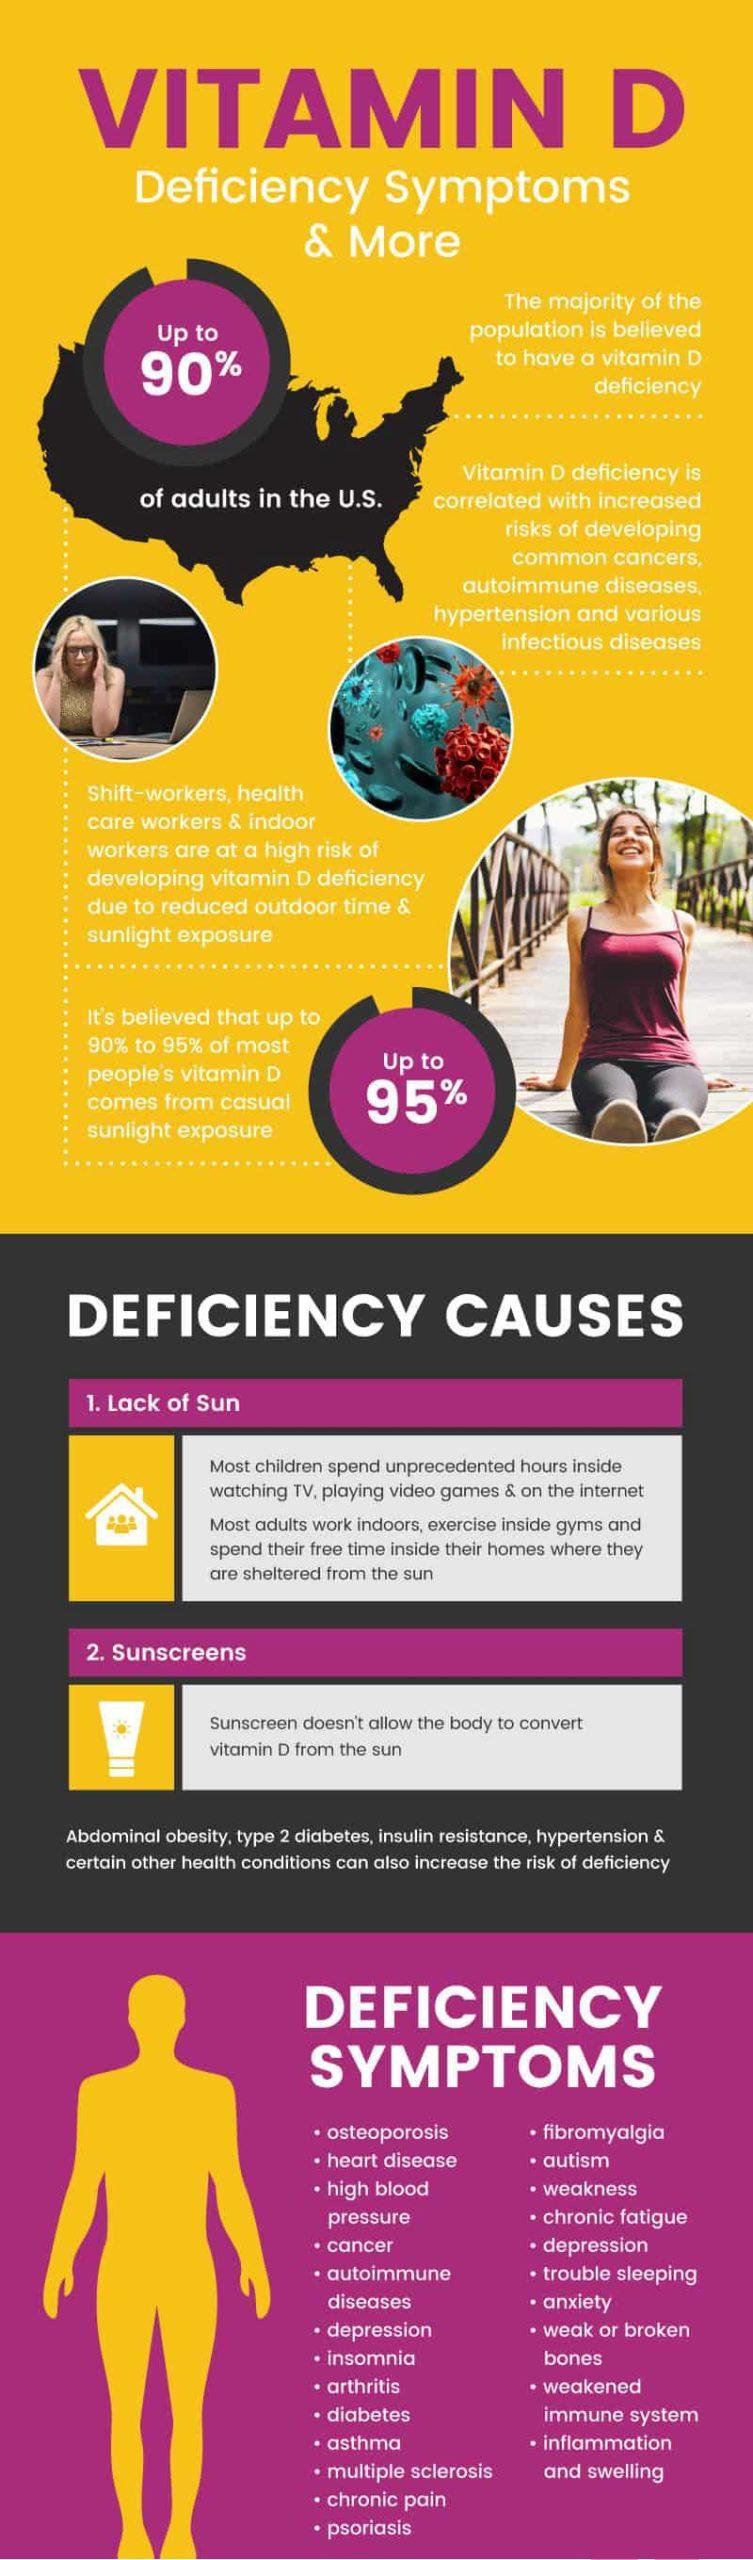 Vitamin D deficiency symptoms - MKexpress.net